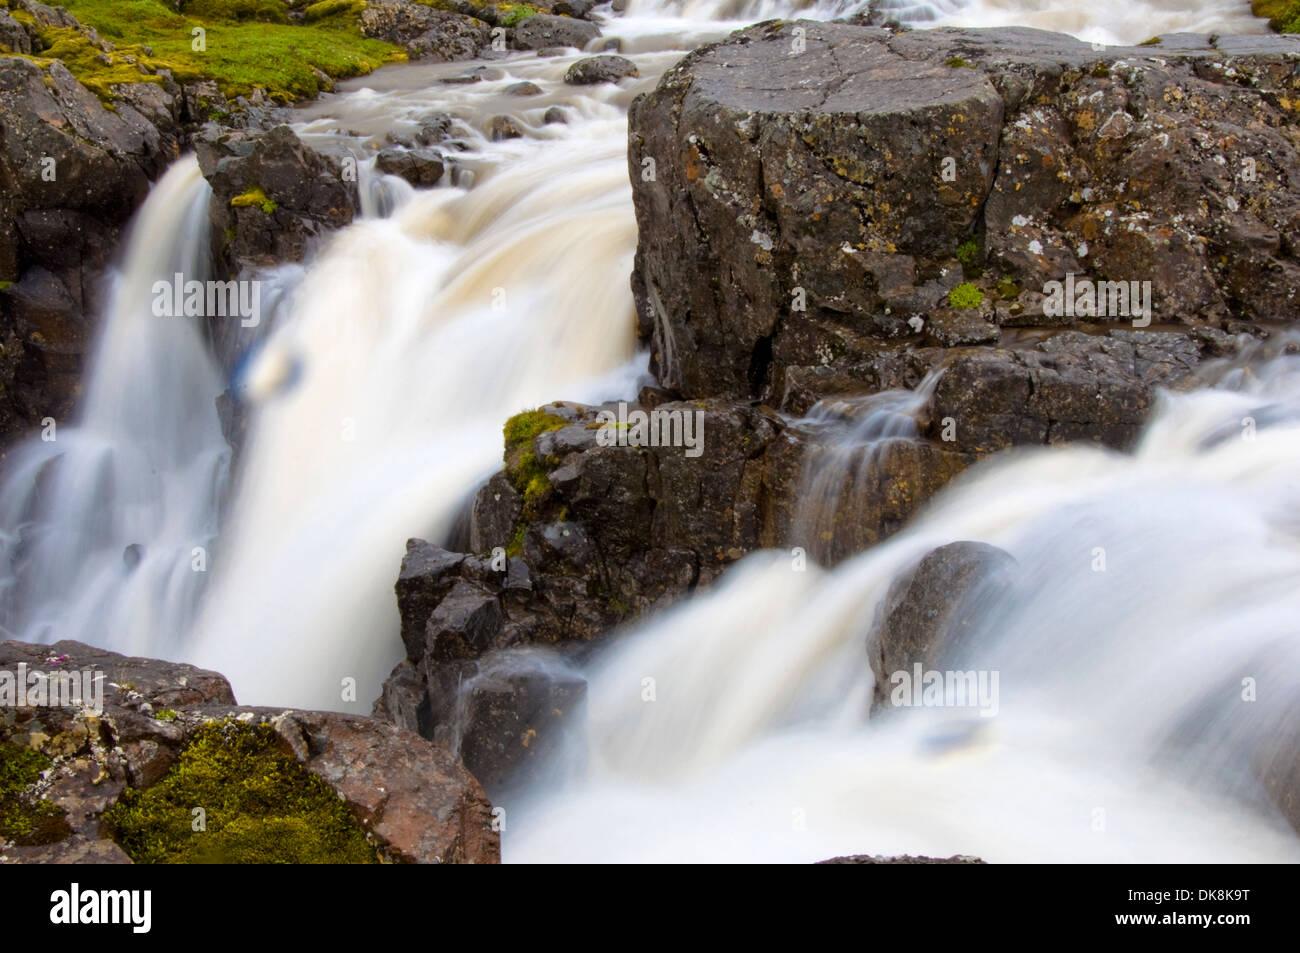 Waterfall near Seydisfjordur, Iceland - Stock Image